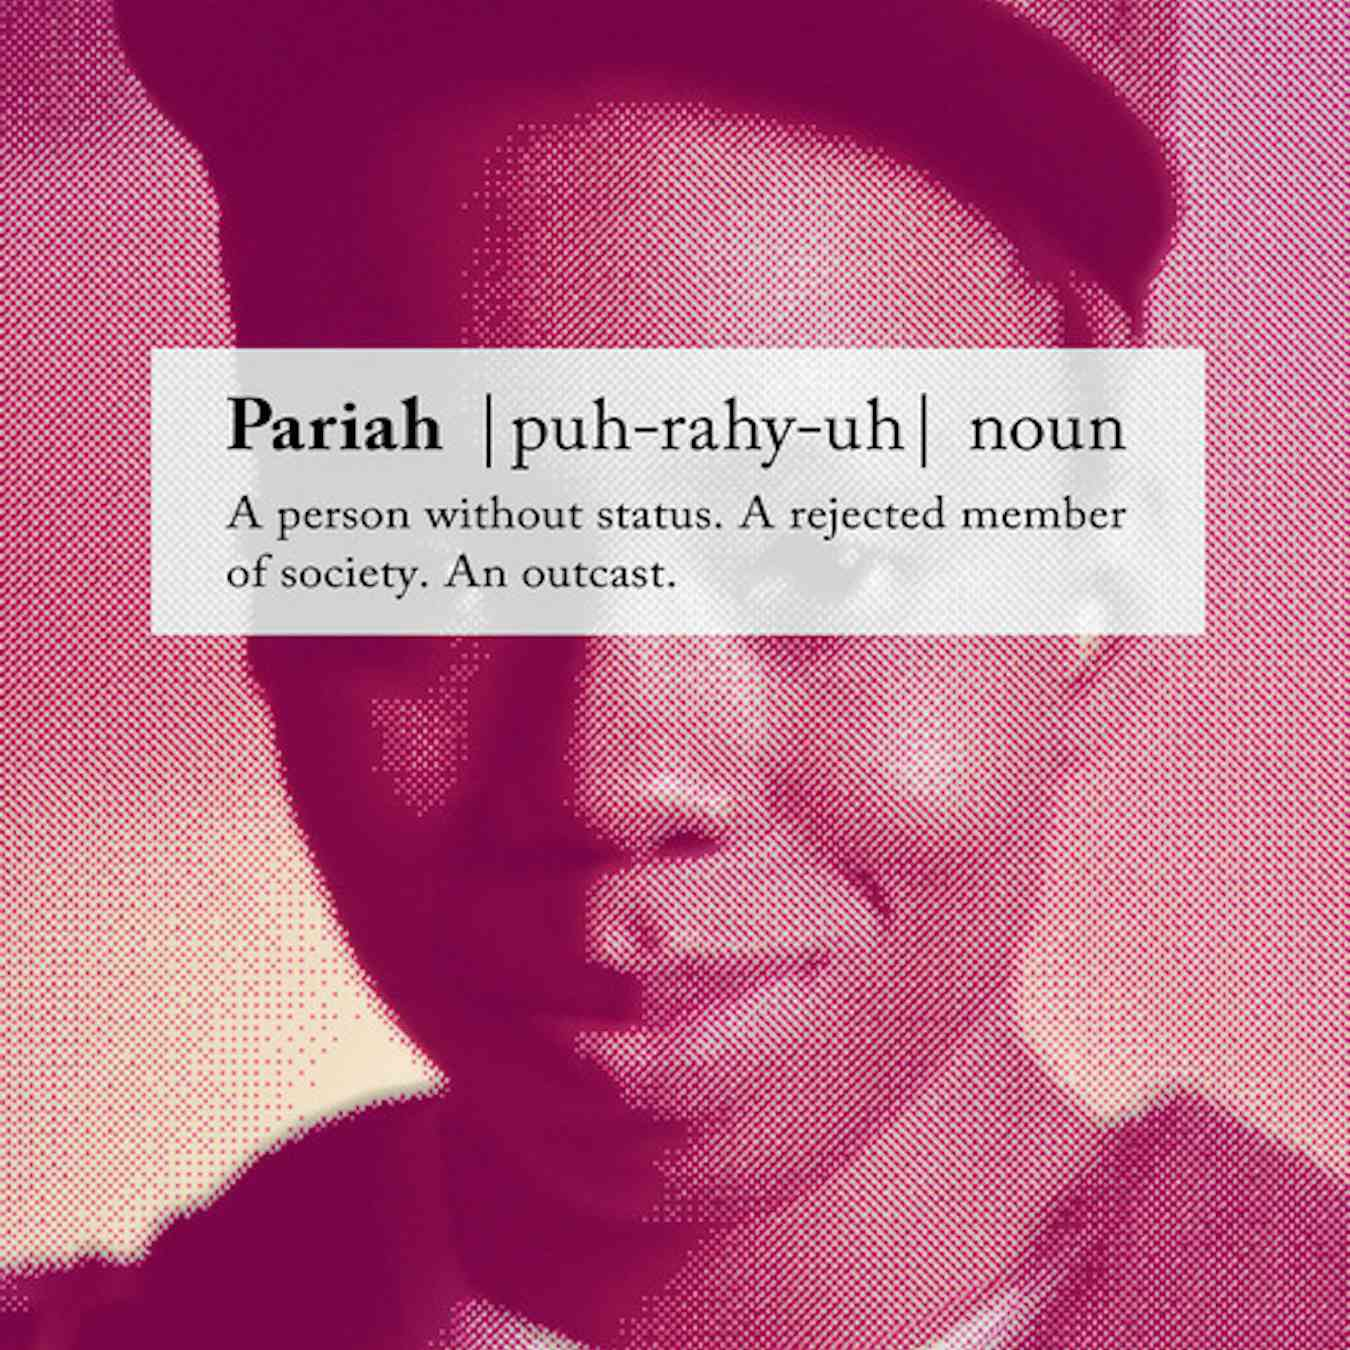 Pariah (2011) movie poster.